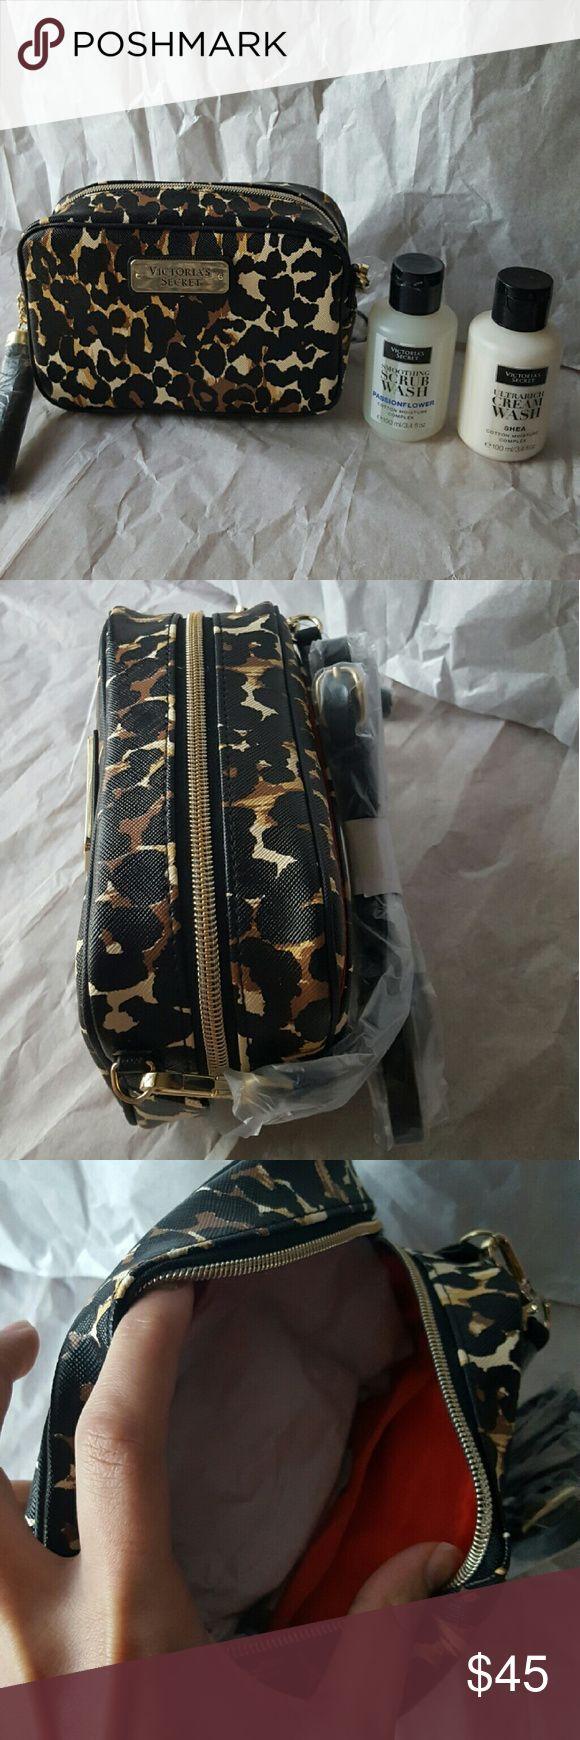 VS Leopard pront crossbody & moisture complex bund crossbody smoothing scrub wash passionflower ultrarich cream wash shea Victoria's Secret Bags Crossbody Bags